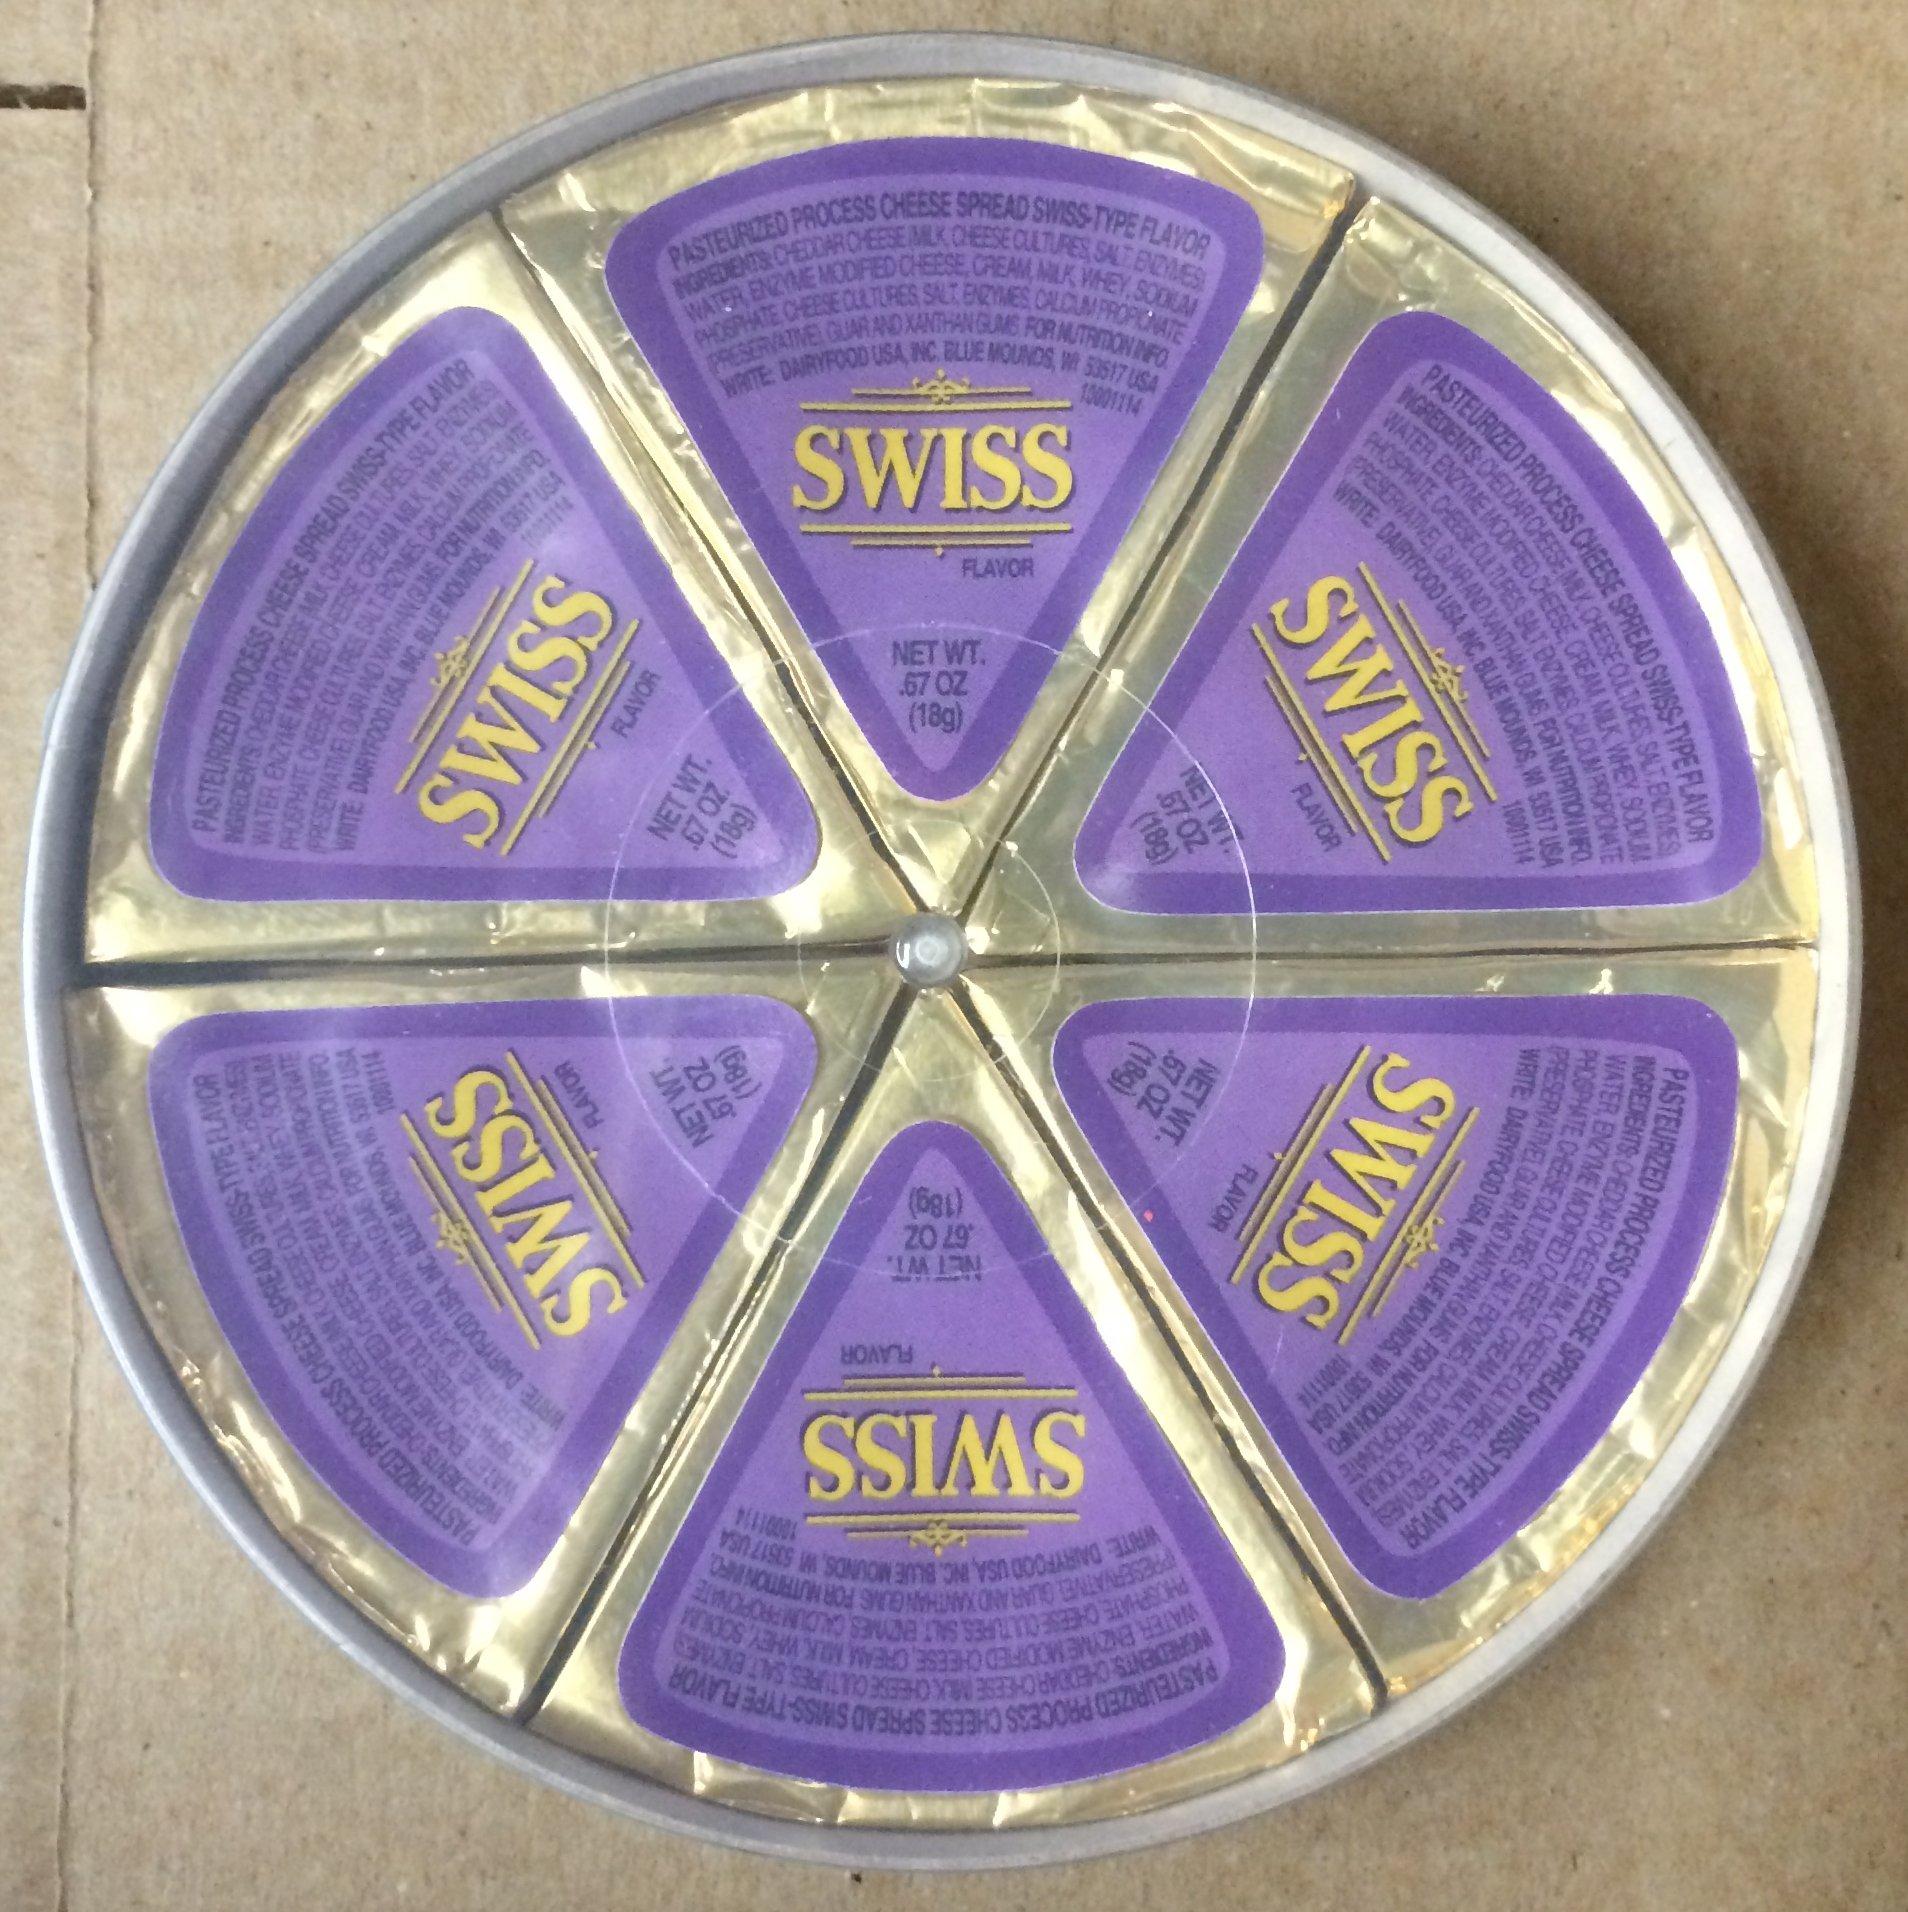 One - 4.02oz Dairy Food USA Swiss Wheel Cheese Wedges